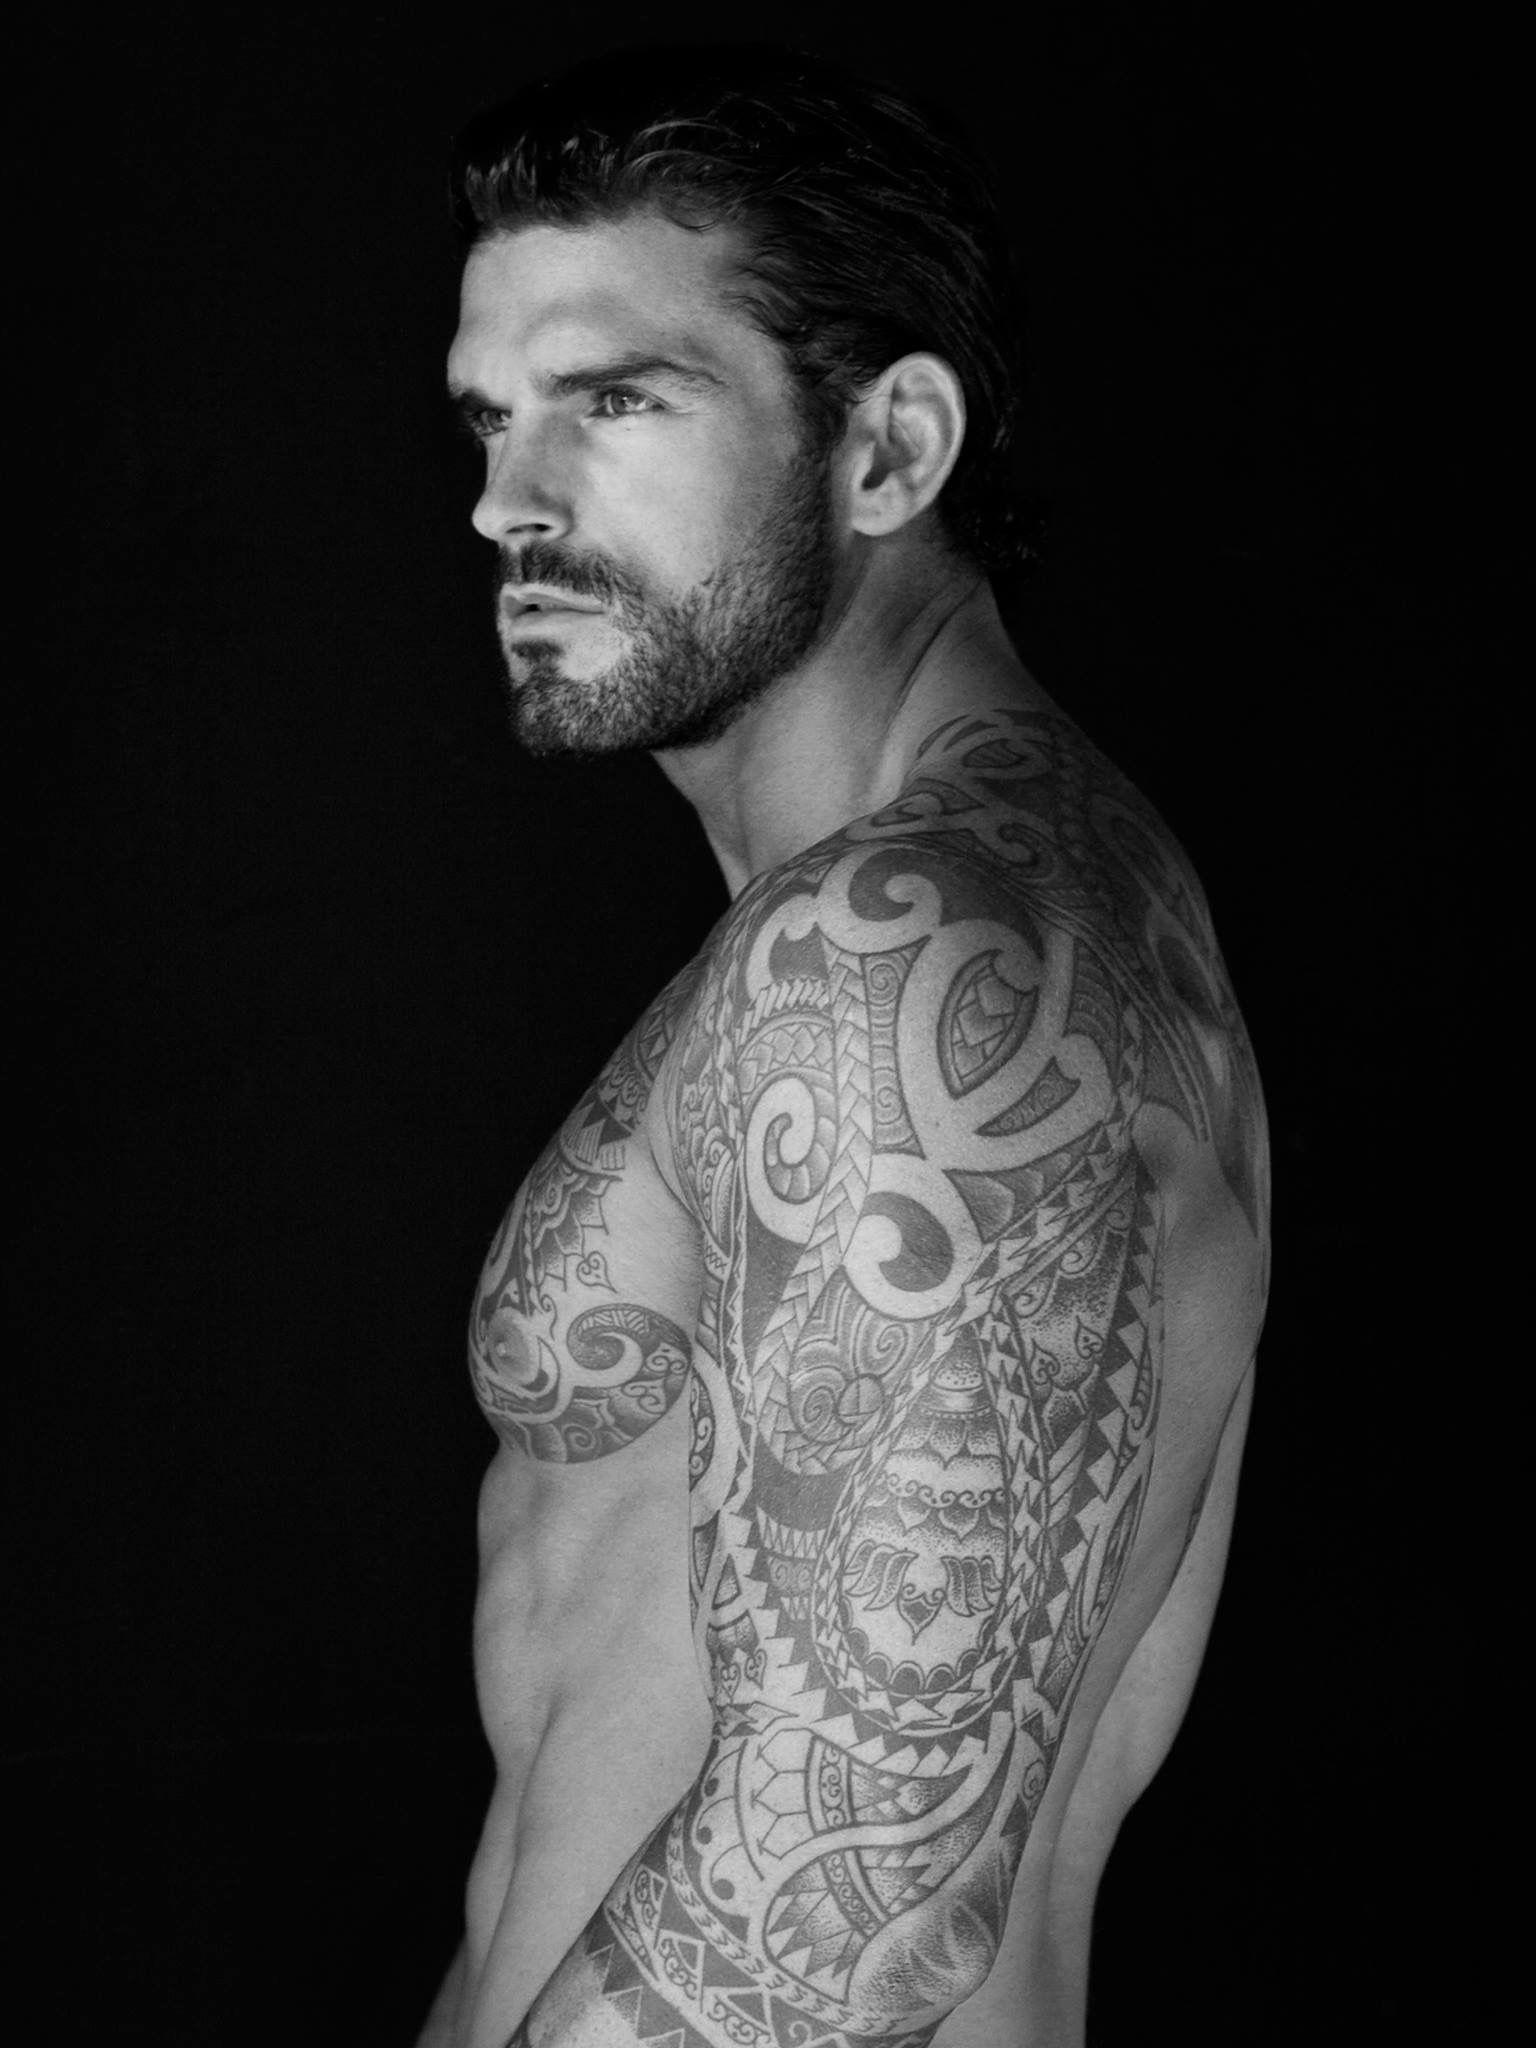 Pin By Nicole Wolensky On Stuart Readon My Dream Man Stuart Reardon Tattoos For Guys Tribal Tattoos